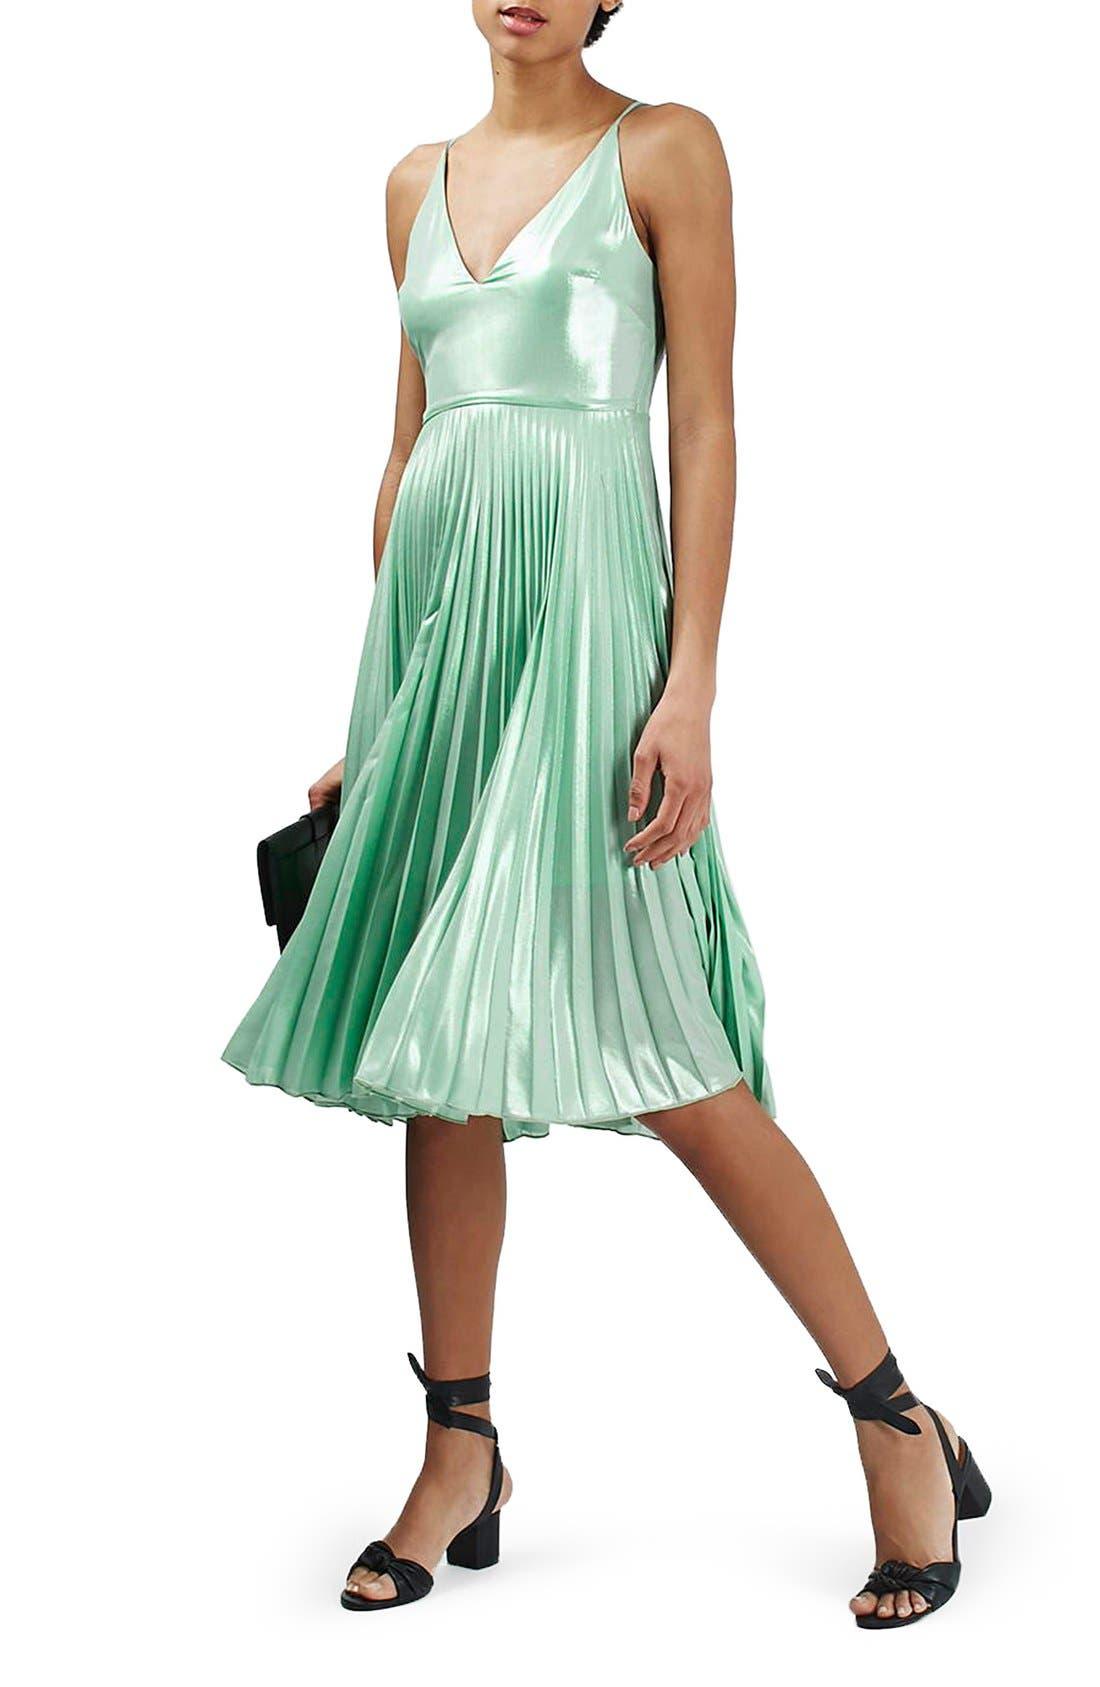 Alternate Image 1 Selected - Topshop Metallic Plunge Pleat Midi Dress